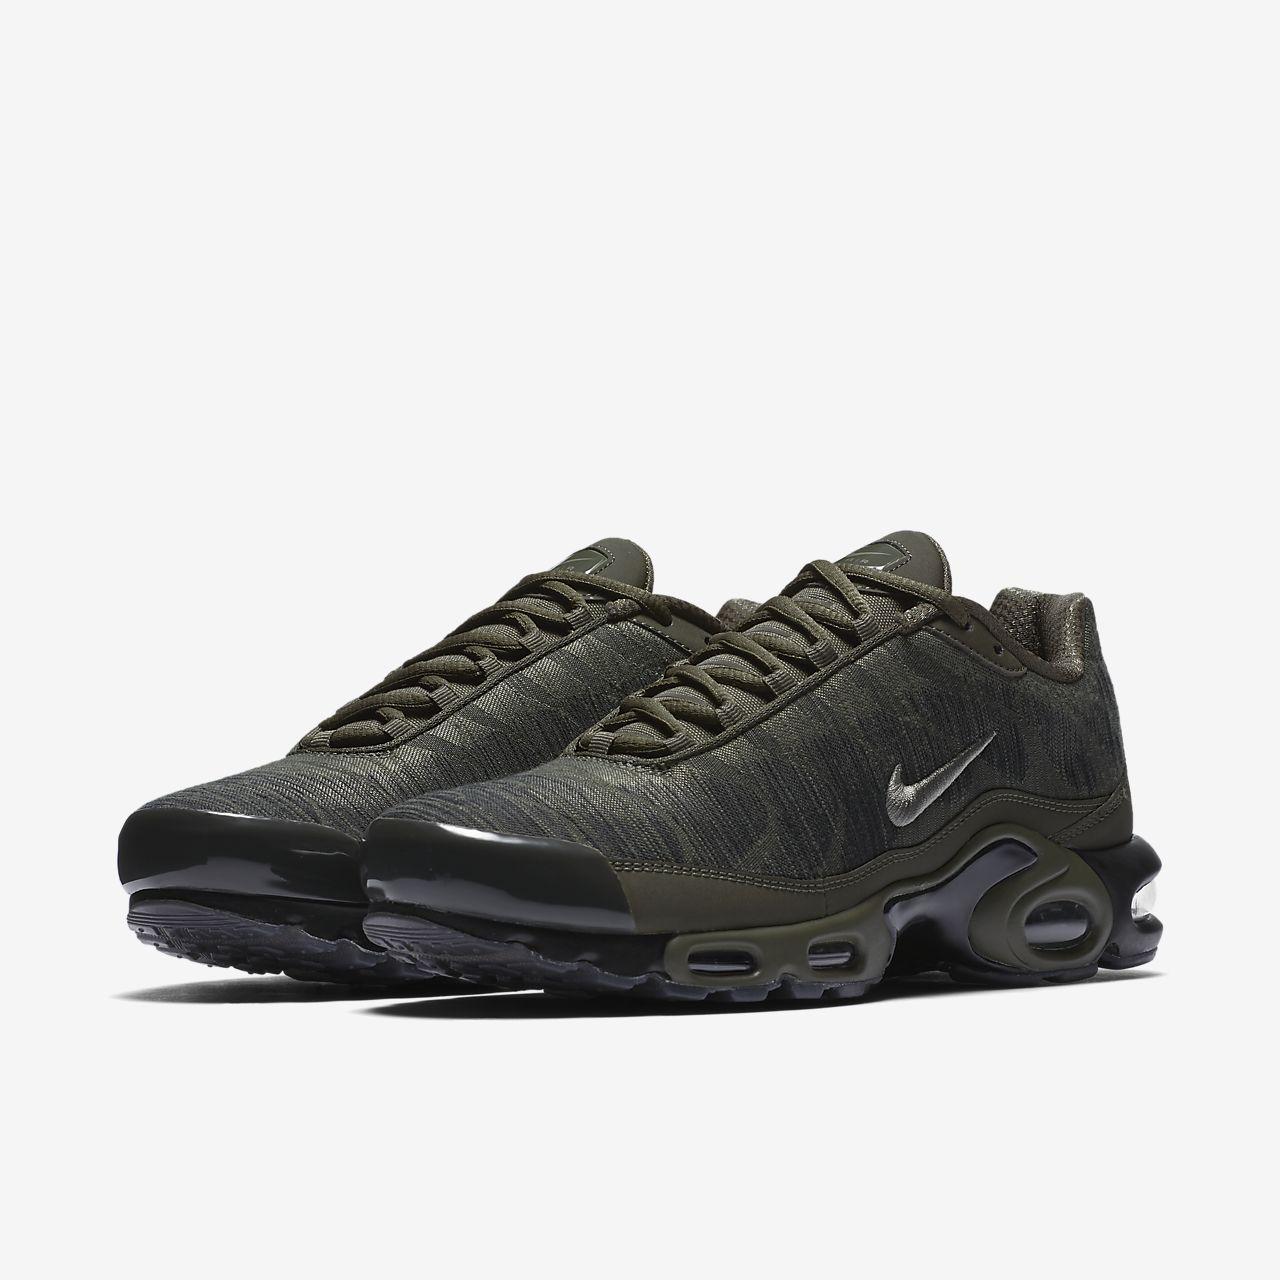 ... Nike Air Max Plus Jacquard Men's Shoe